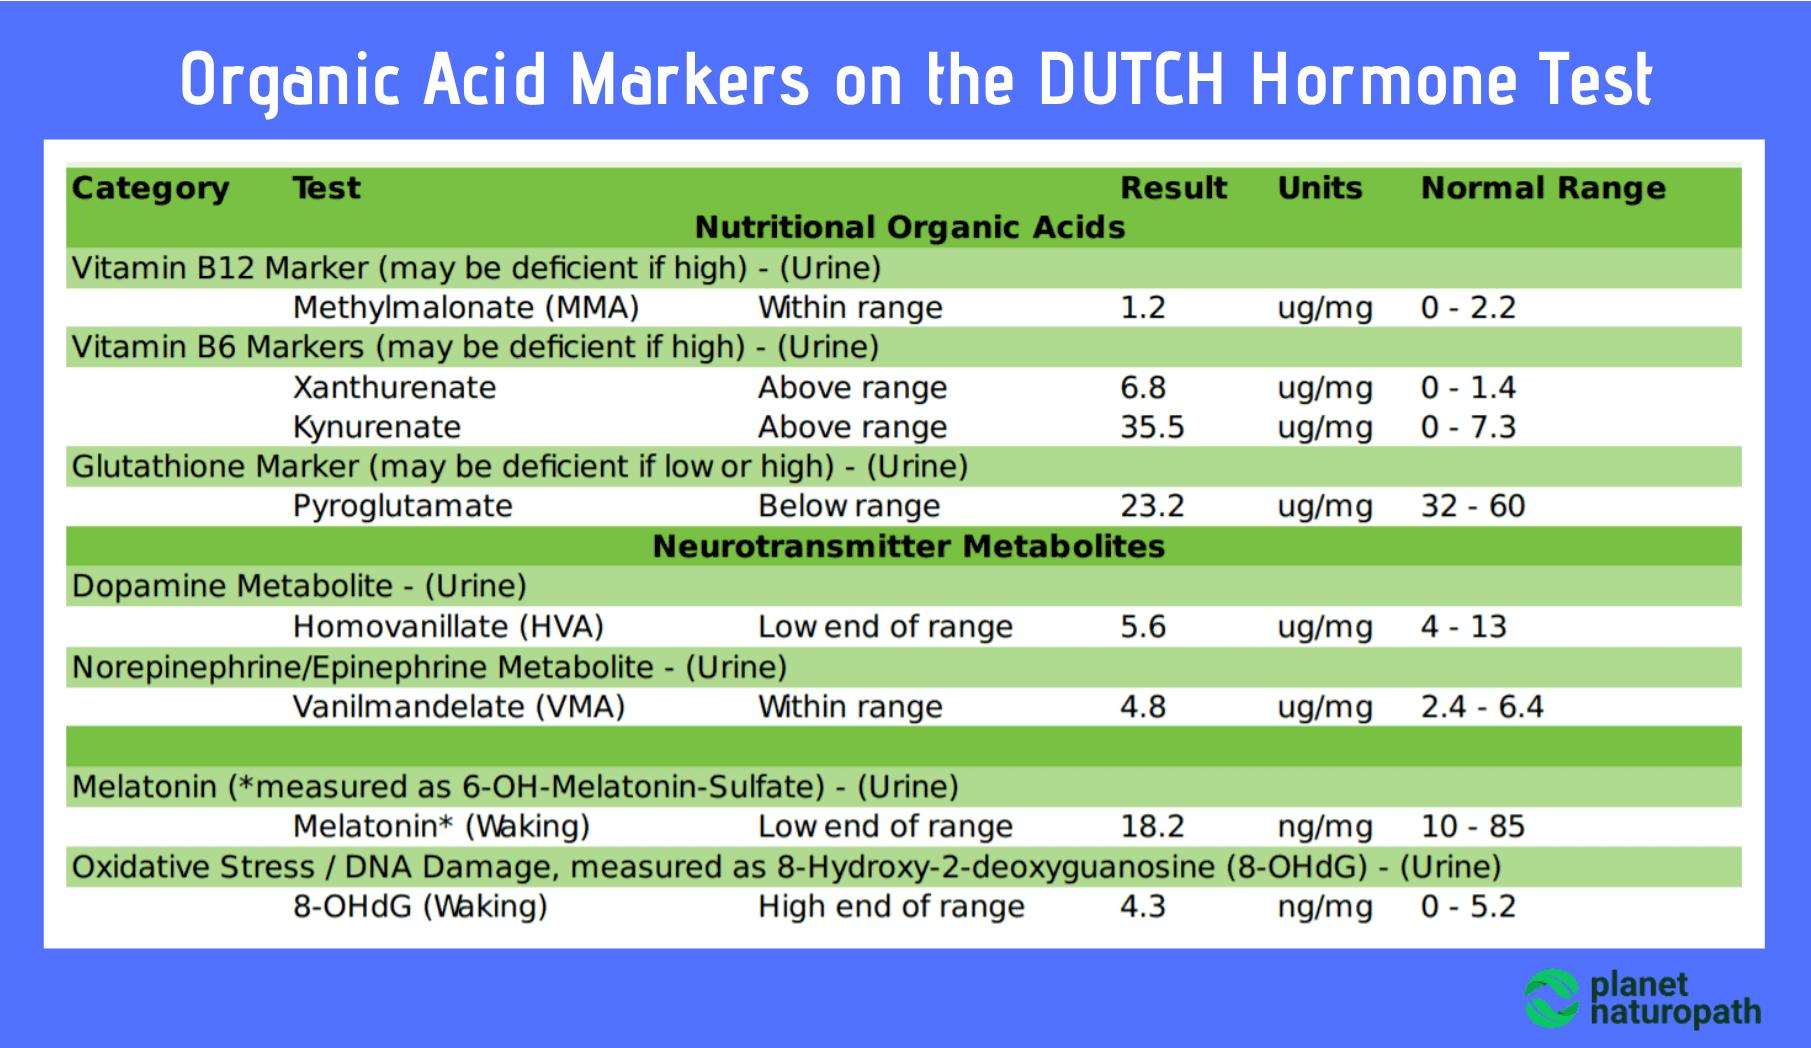 Organic-Acid-Markers-on-the-DUTCH-Hormone-Test